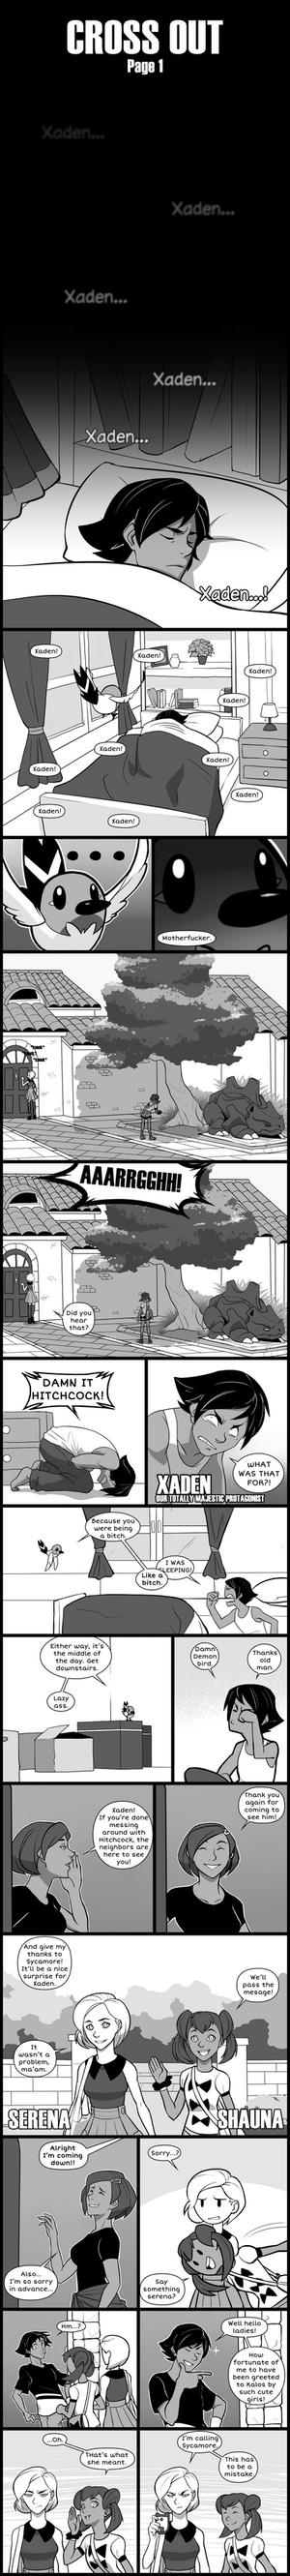 Cross Out [Pokemon X blind nuzlocke] page 1 by Protocol00